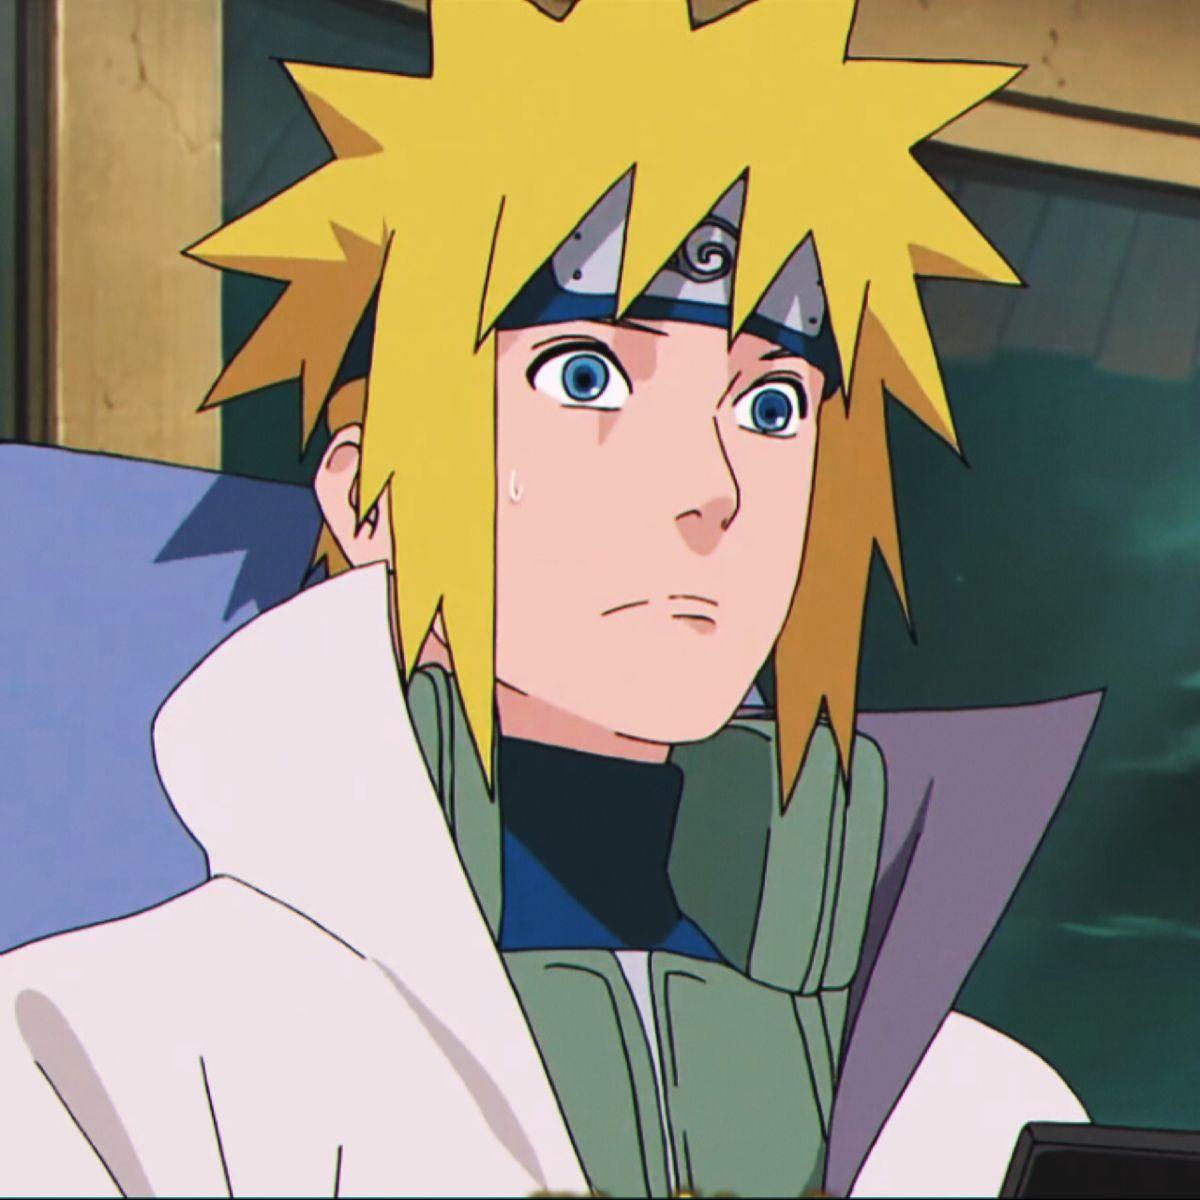 𝗠𝗶𝗻𝗮𝘁𝗼 𝗡𝗮𝗺𝗶𝗸𝗮𝘇𝗲 Naruto Shippuden Characters Anime Naruto Wallpaper Iphone